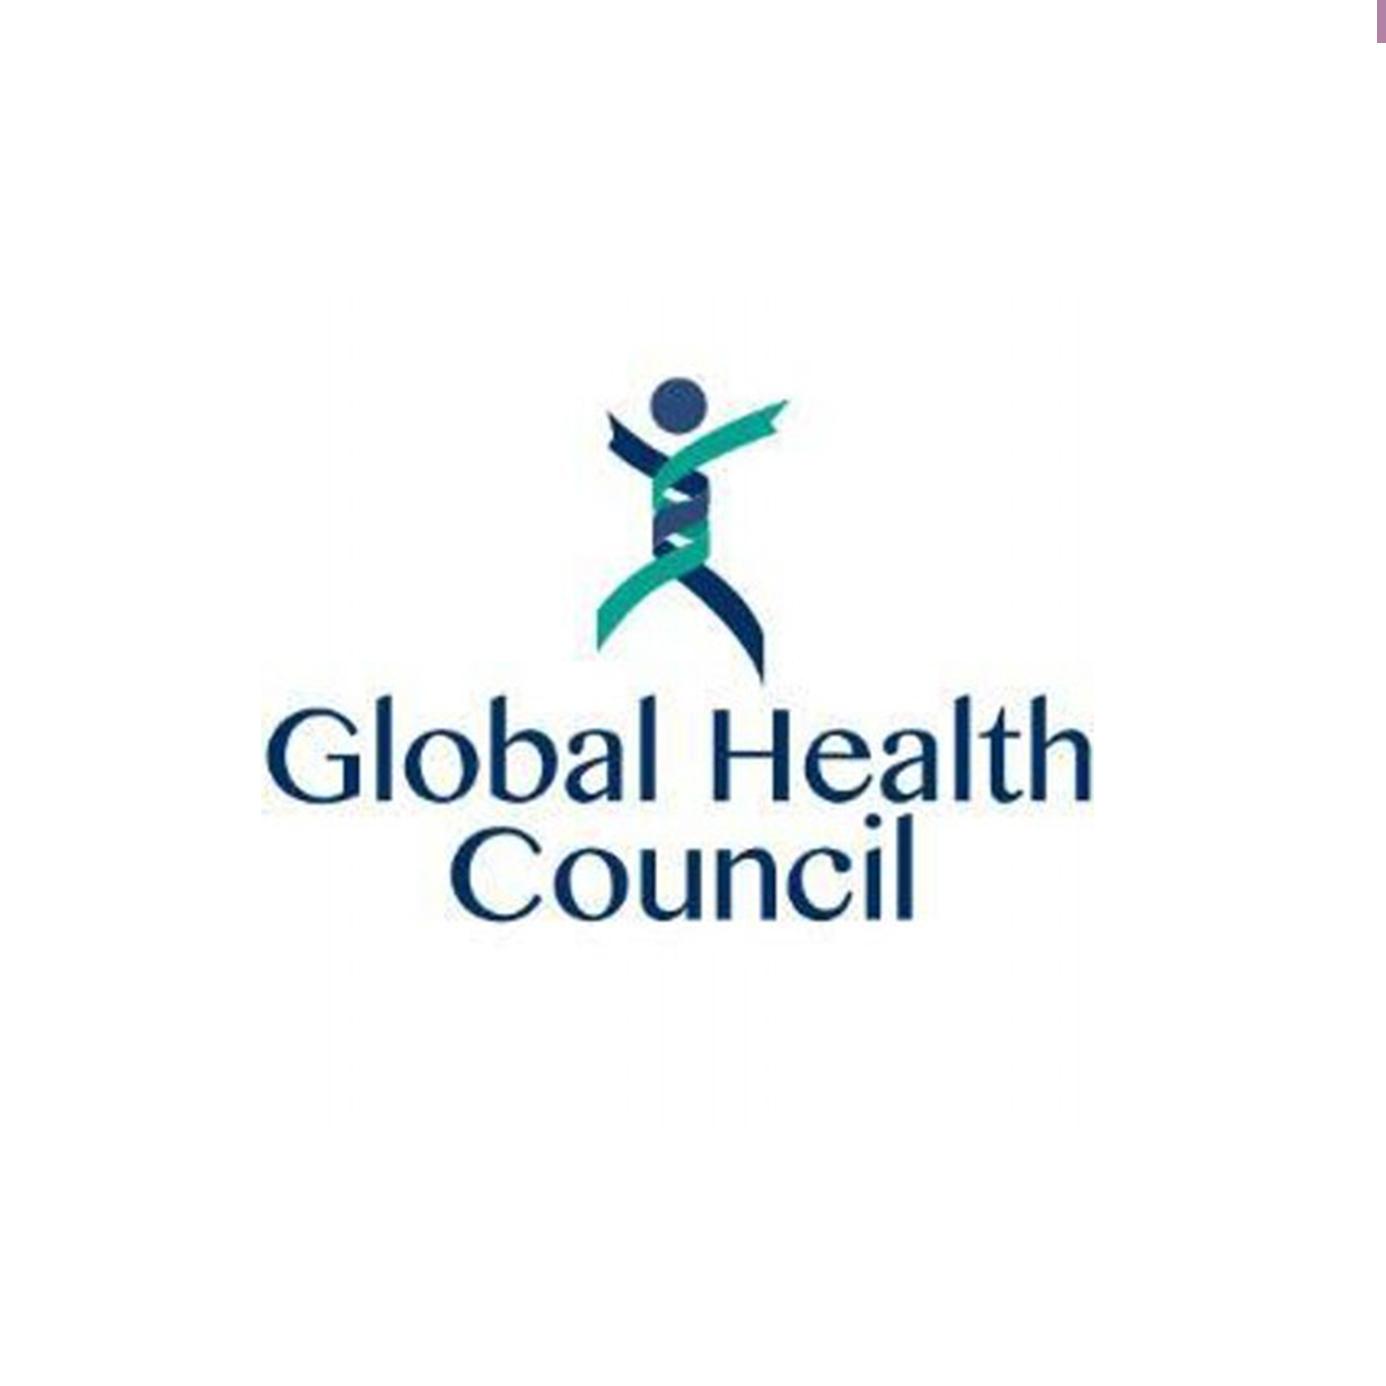 global health council.jpg